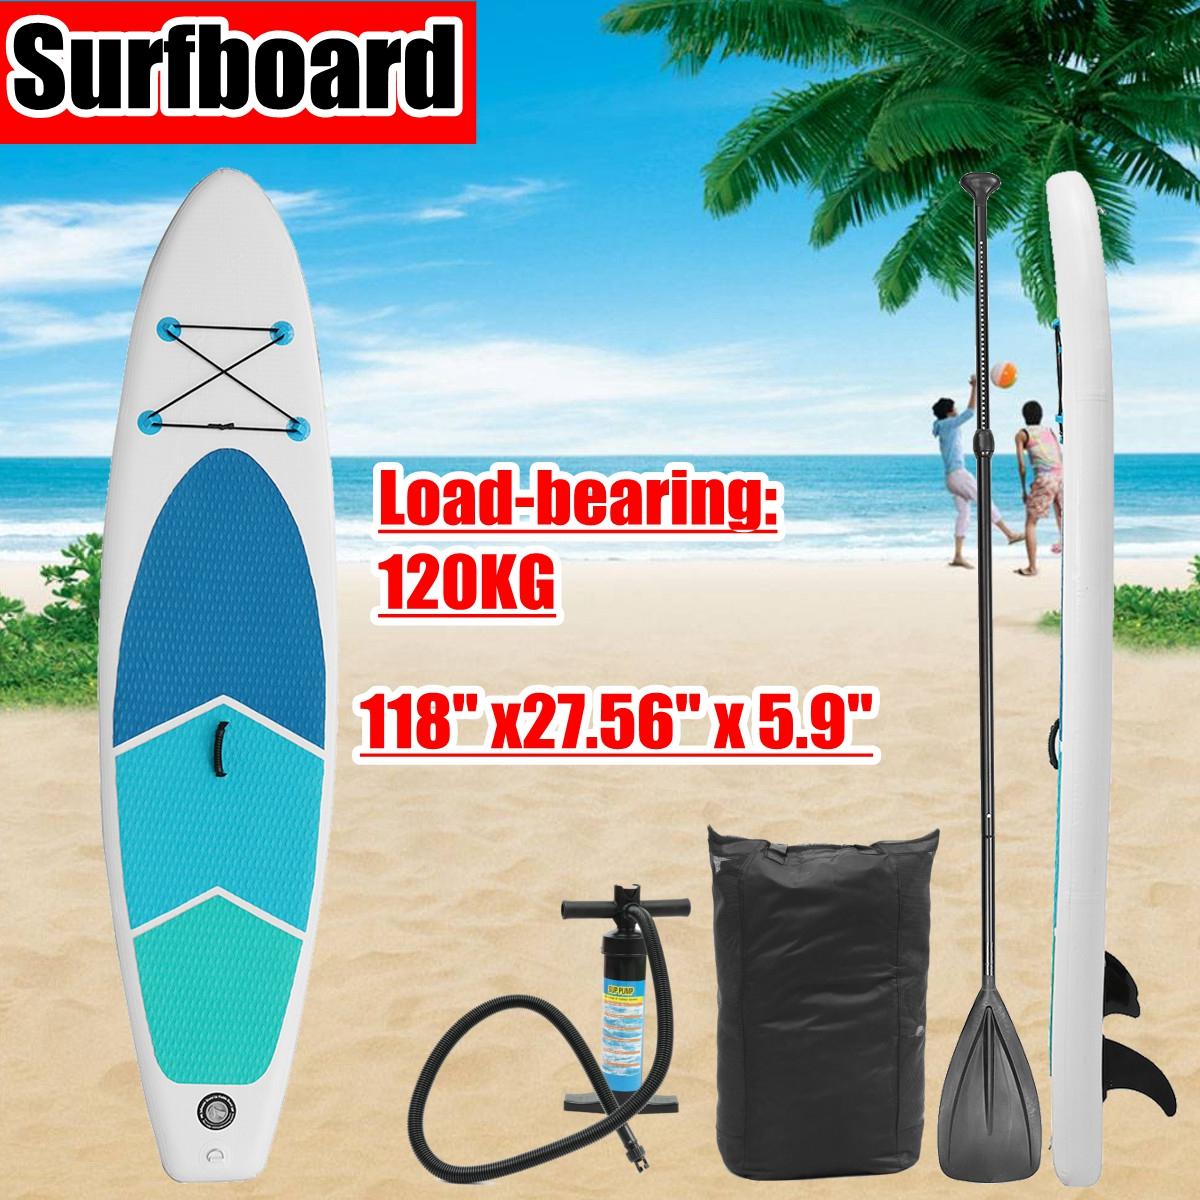 Gofun hergestellt 3 mt X 0,7 mt X 0,15 mt Zoll Stand Up Paddle Surfbrett Aufblasbare Bord SUP Set Welle R ider + Pumpe aufblasbare surf board paddel boot